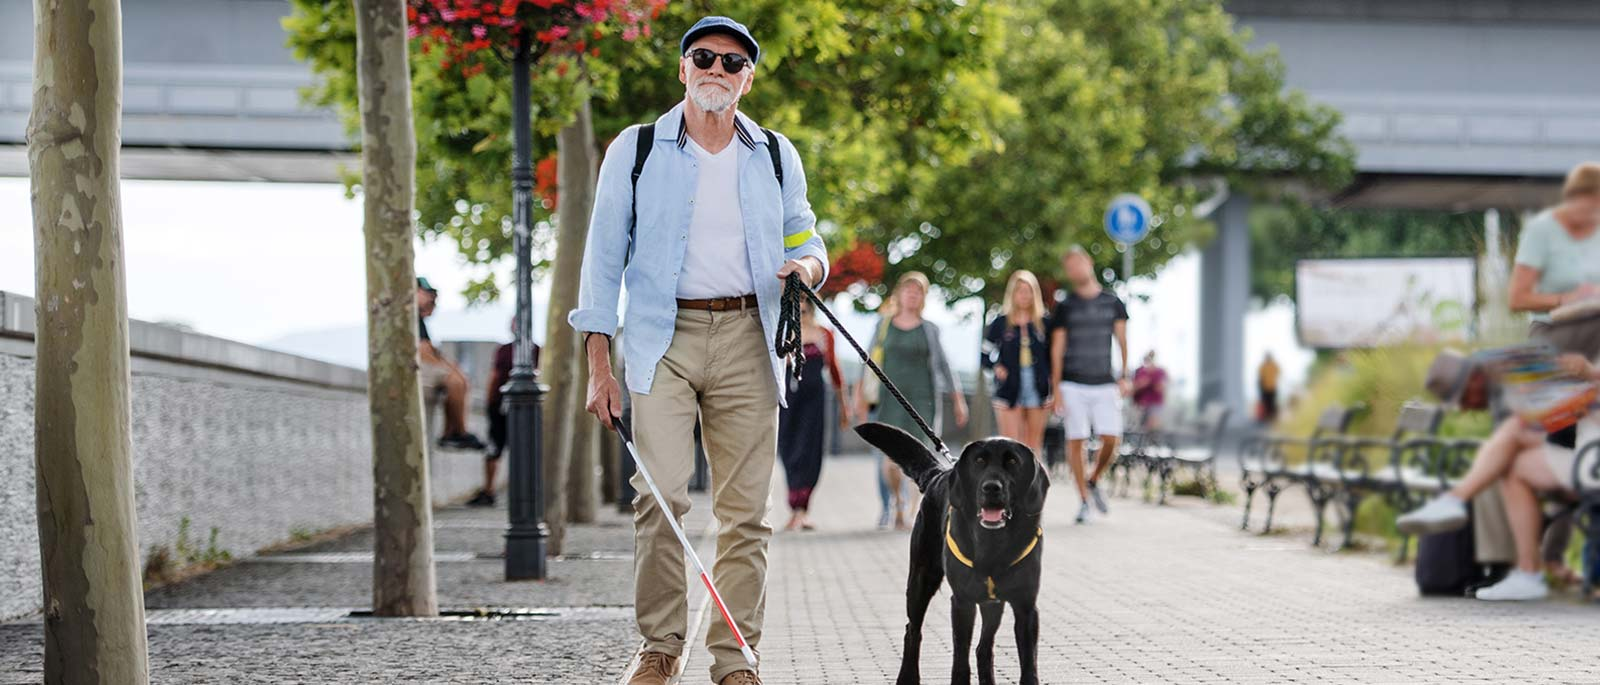 Man walking with service dog